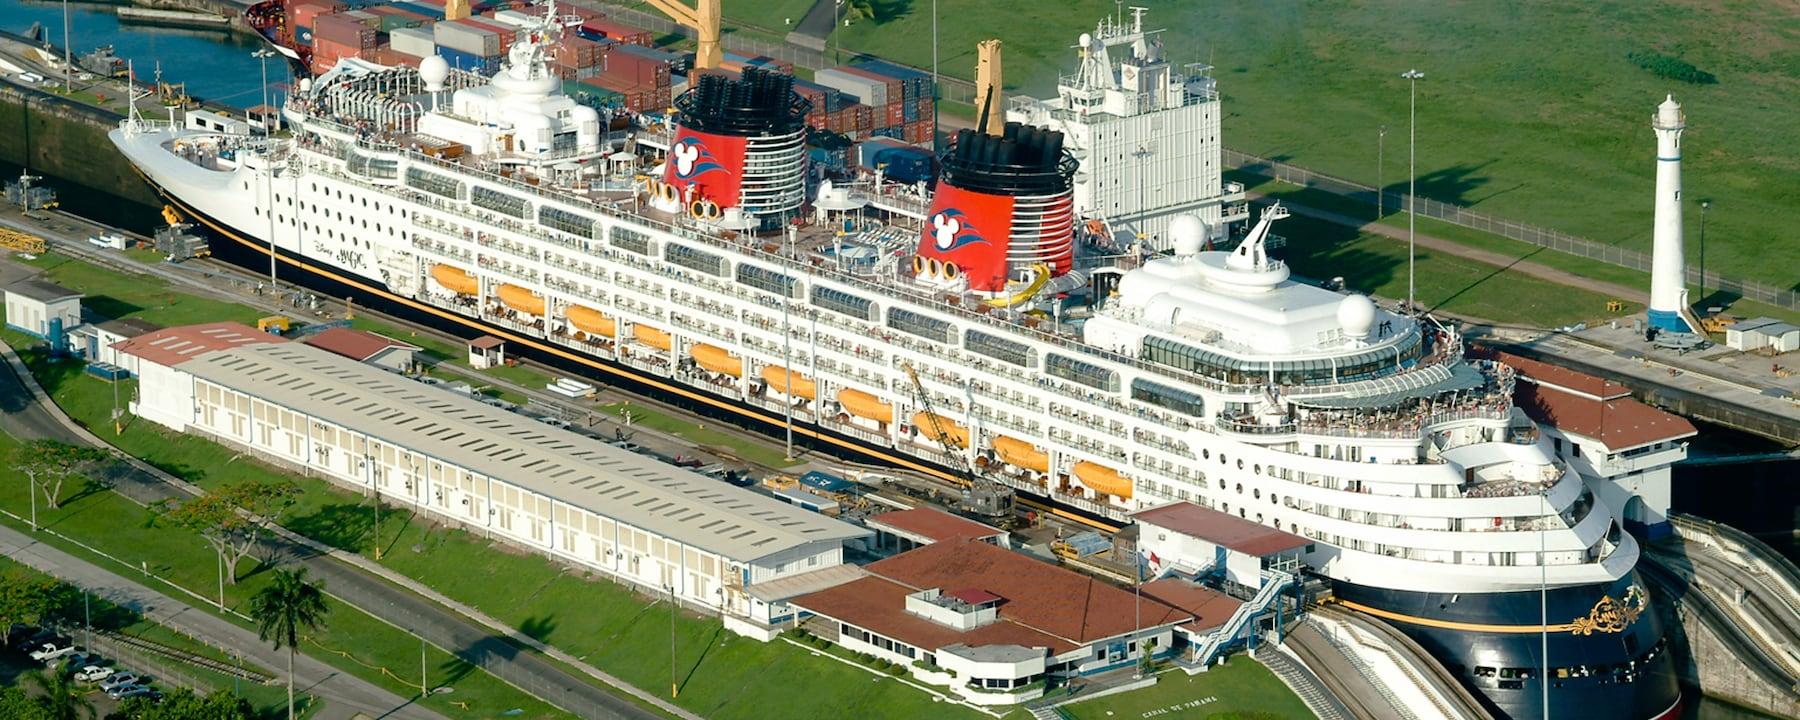 Panama Canal Disney